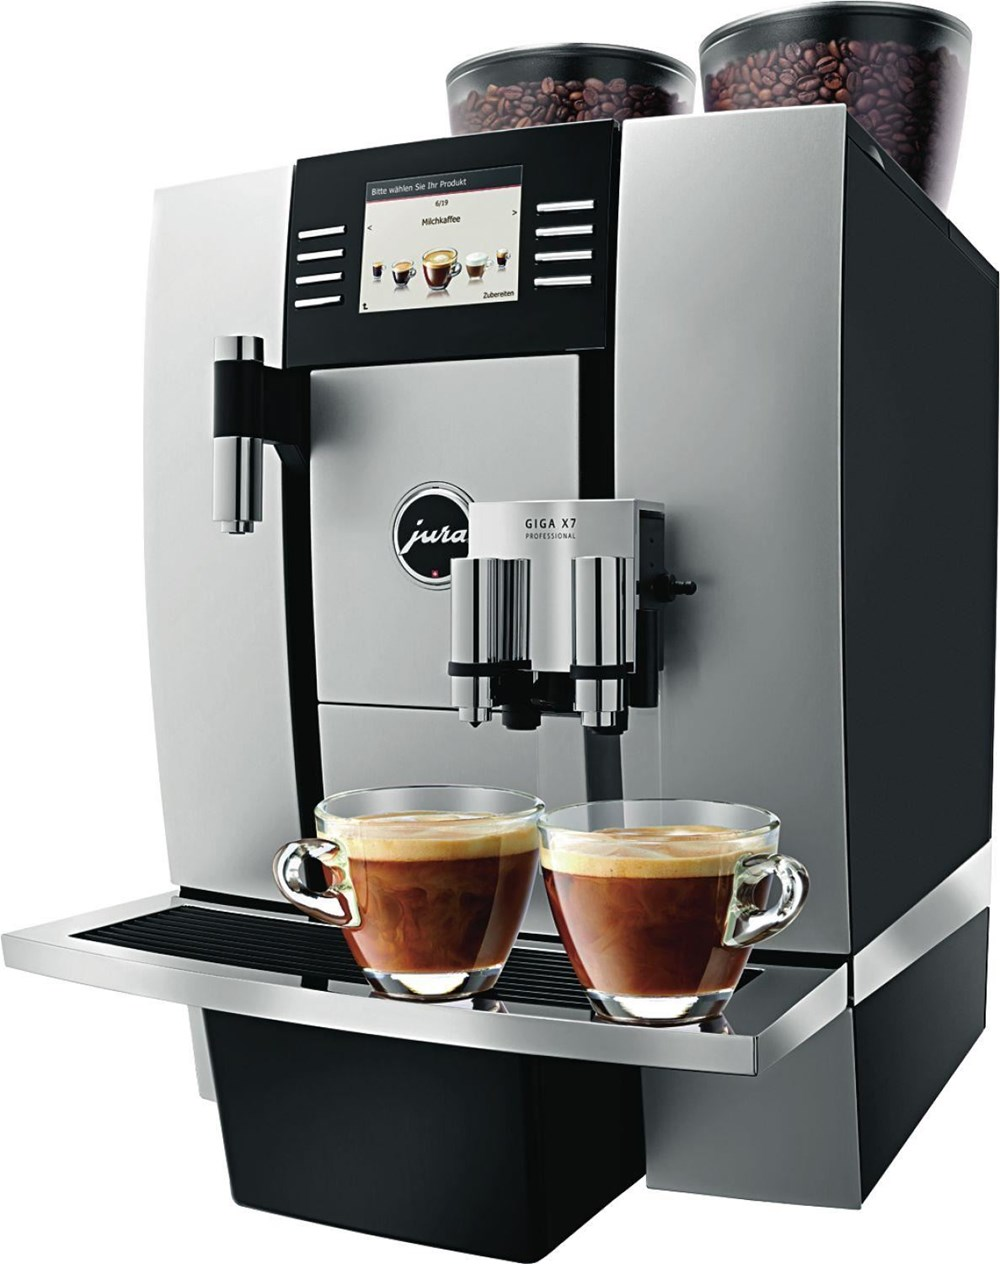 jura giga x7c preisvergleich kaffeevollautomat g nstig. Black Bedroom Furniture Sets. Home Design Ideas